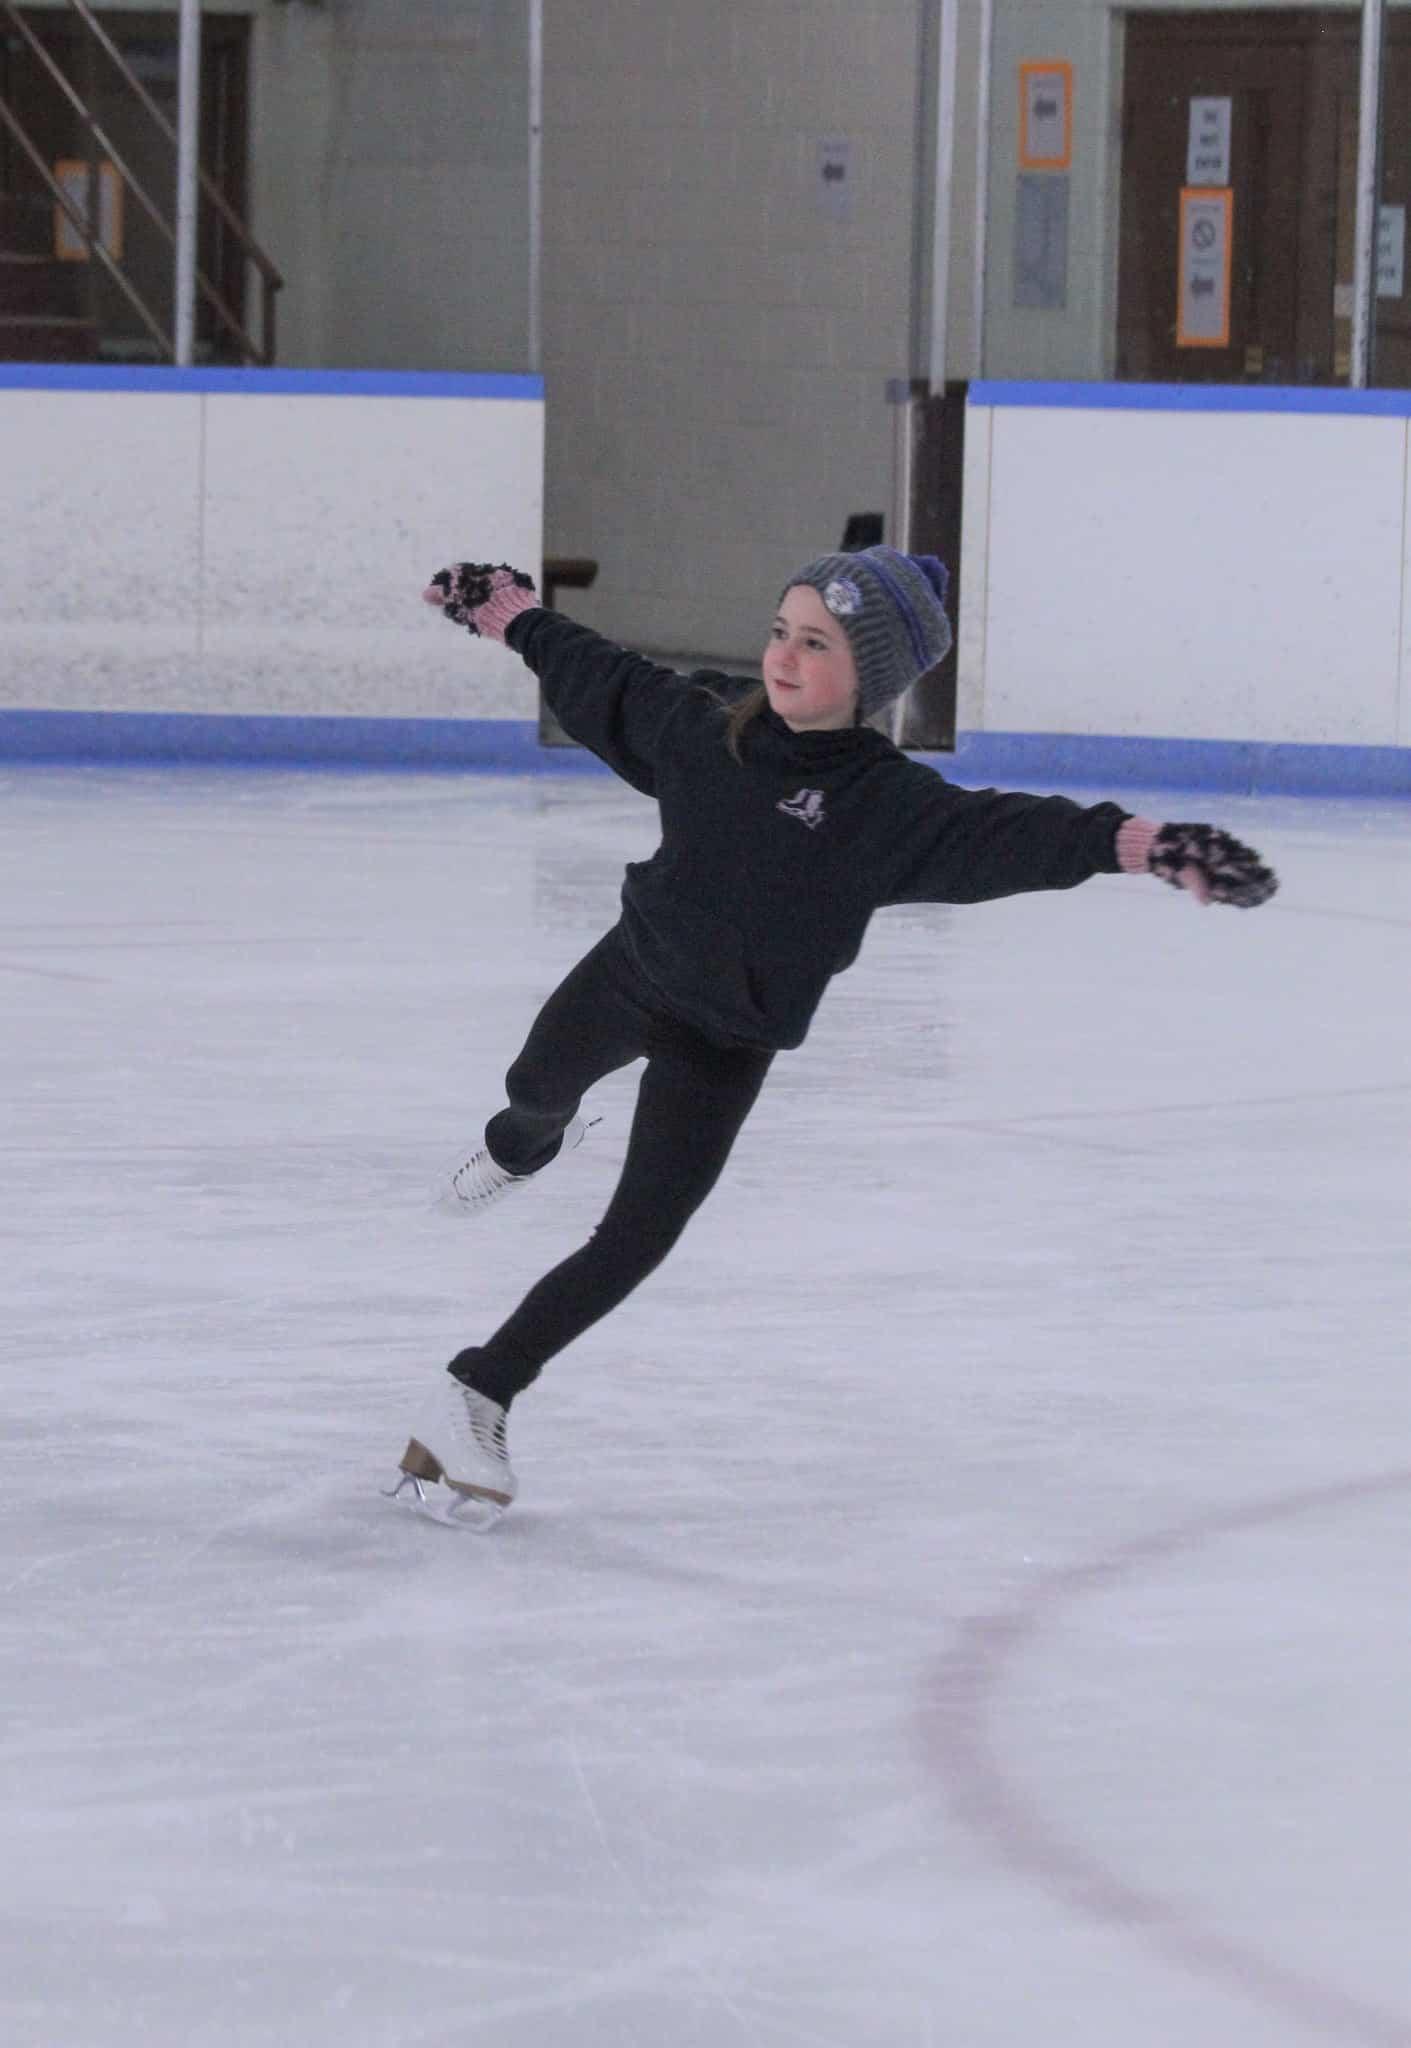 20210401-last skate 1